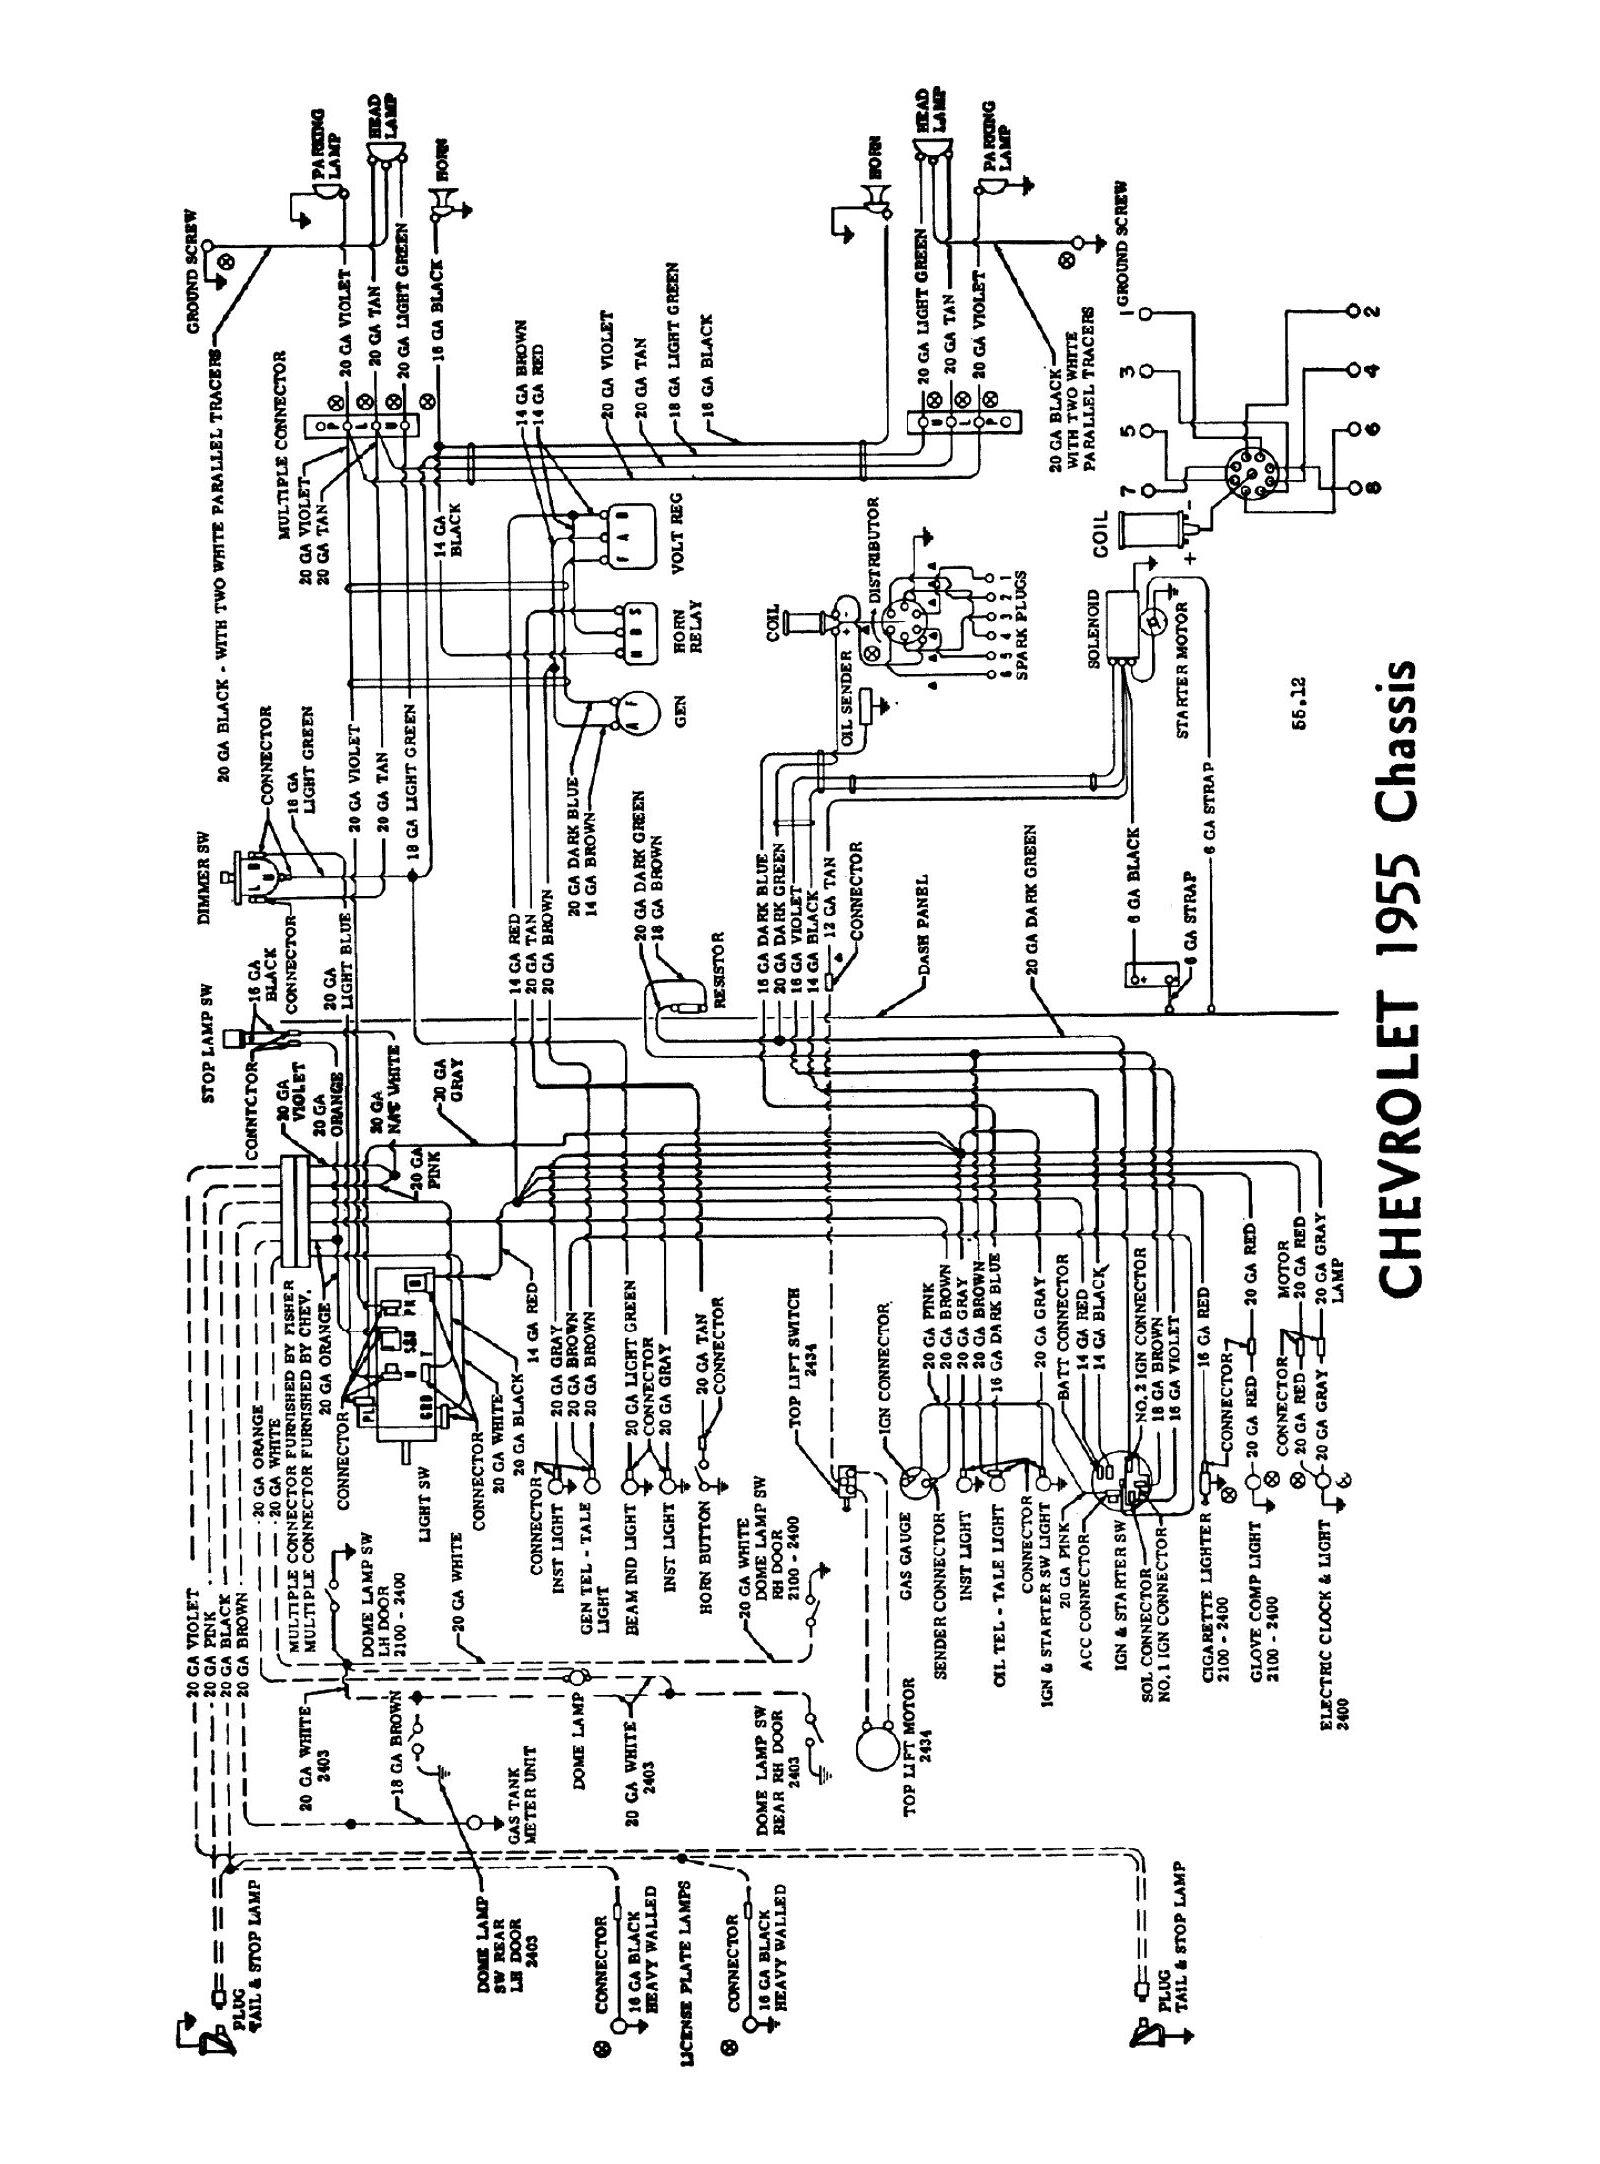 Chevy Wiring Diagrams - Fuel Sending Unit Wiring Diagram